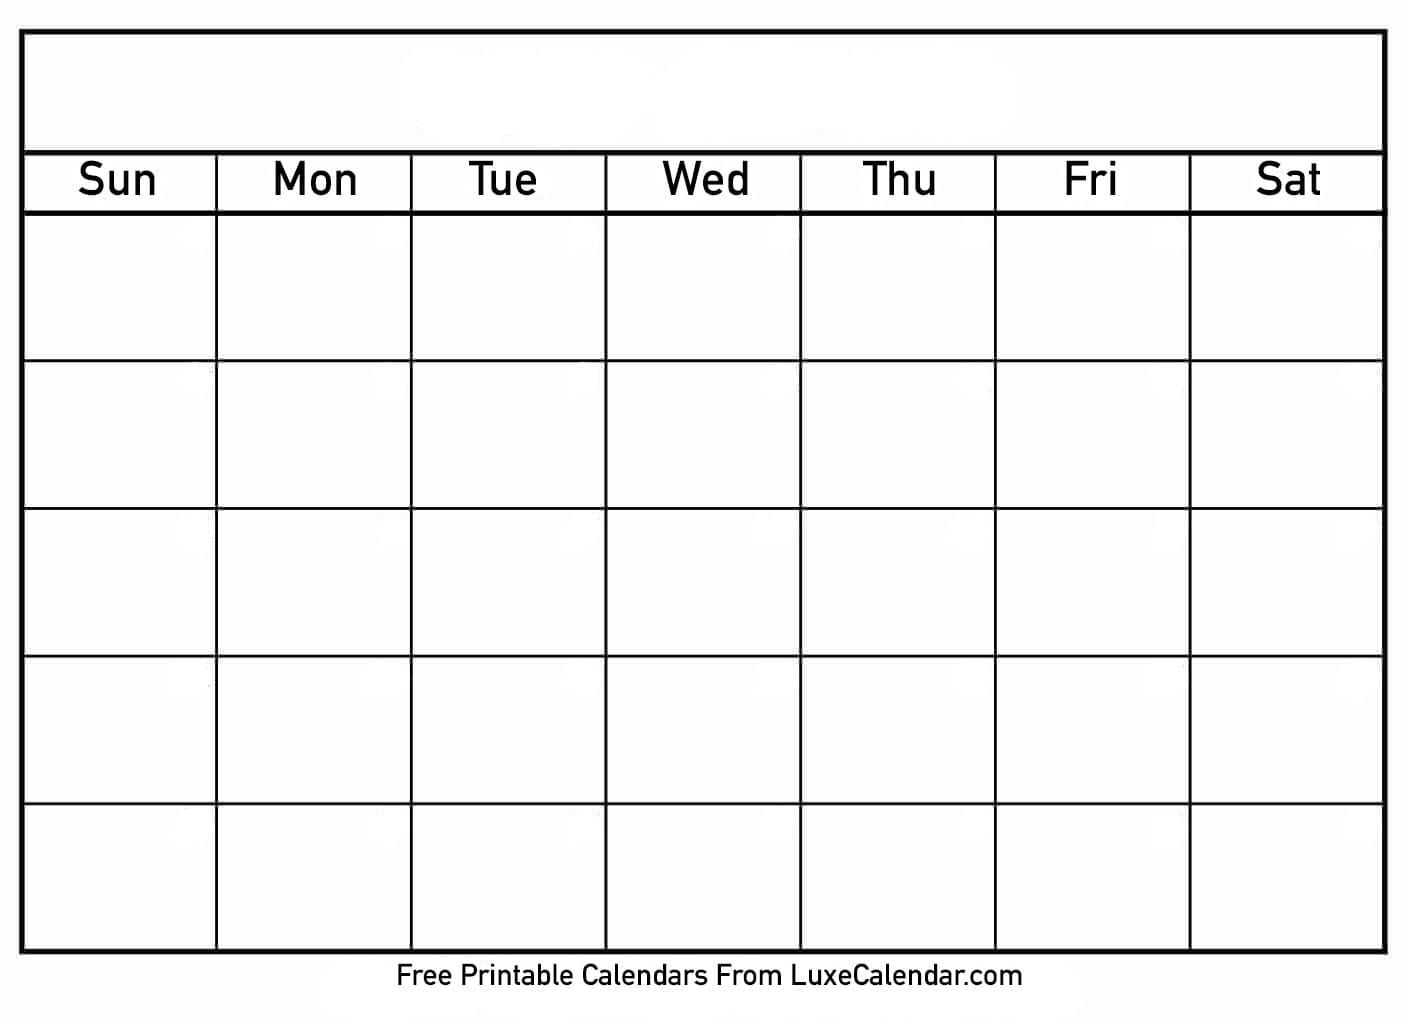 Empty Ule Template Blank Calendar Free Printable Microsoft Word